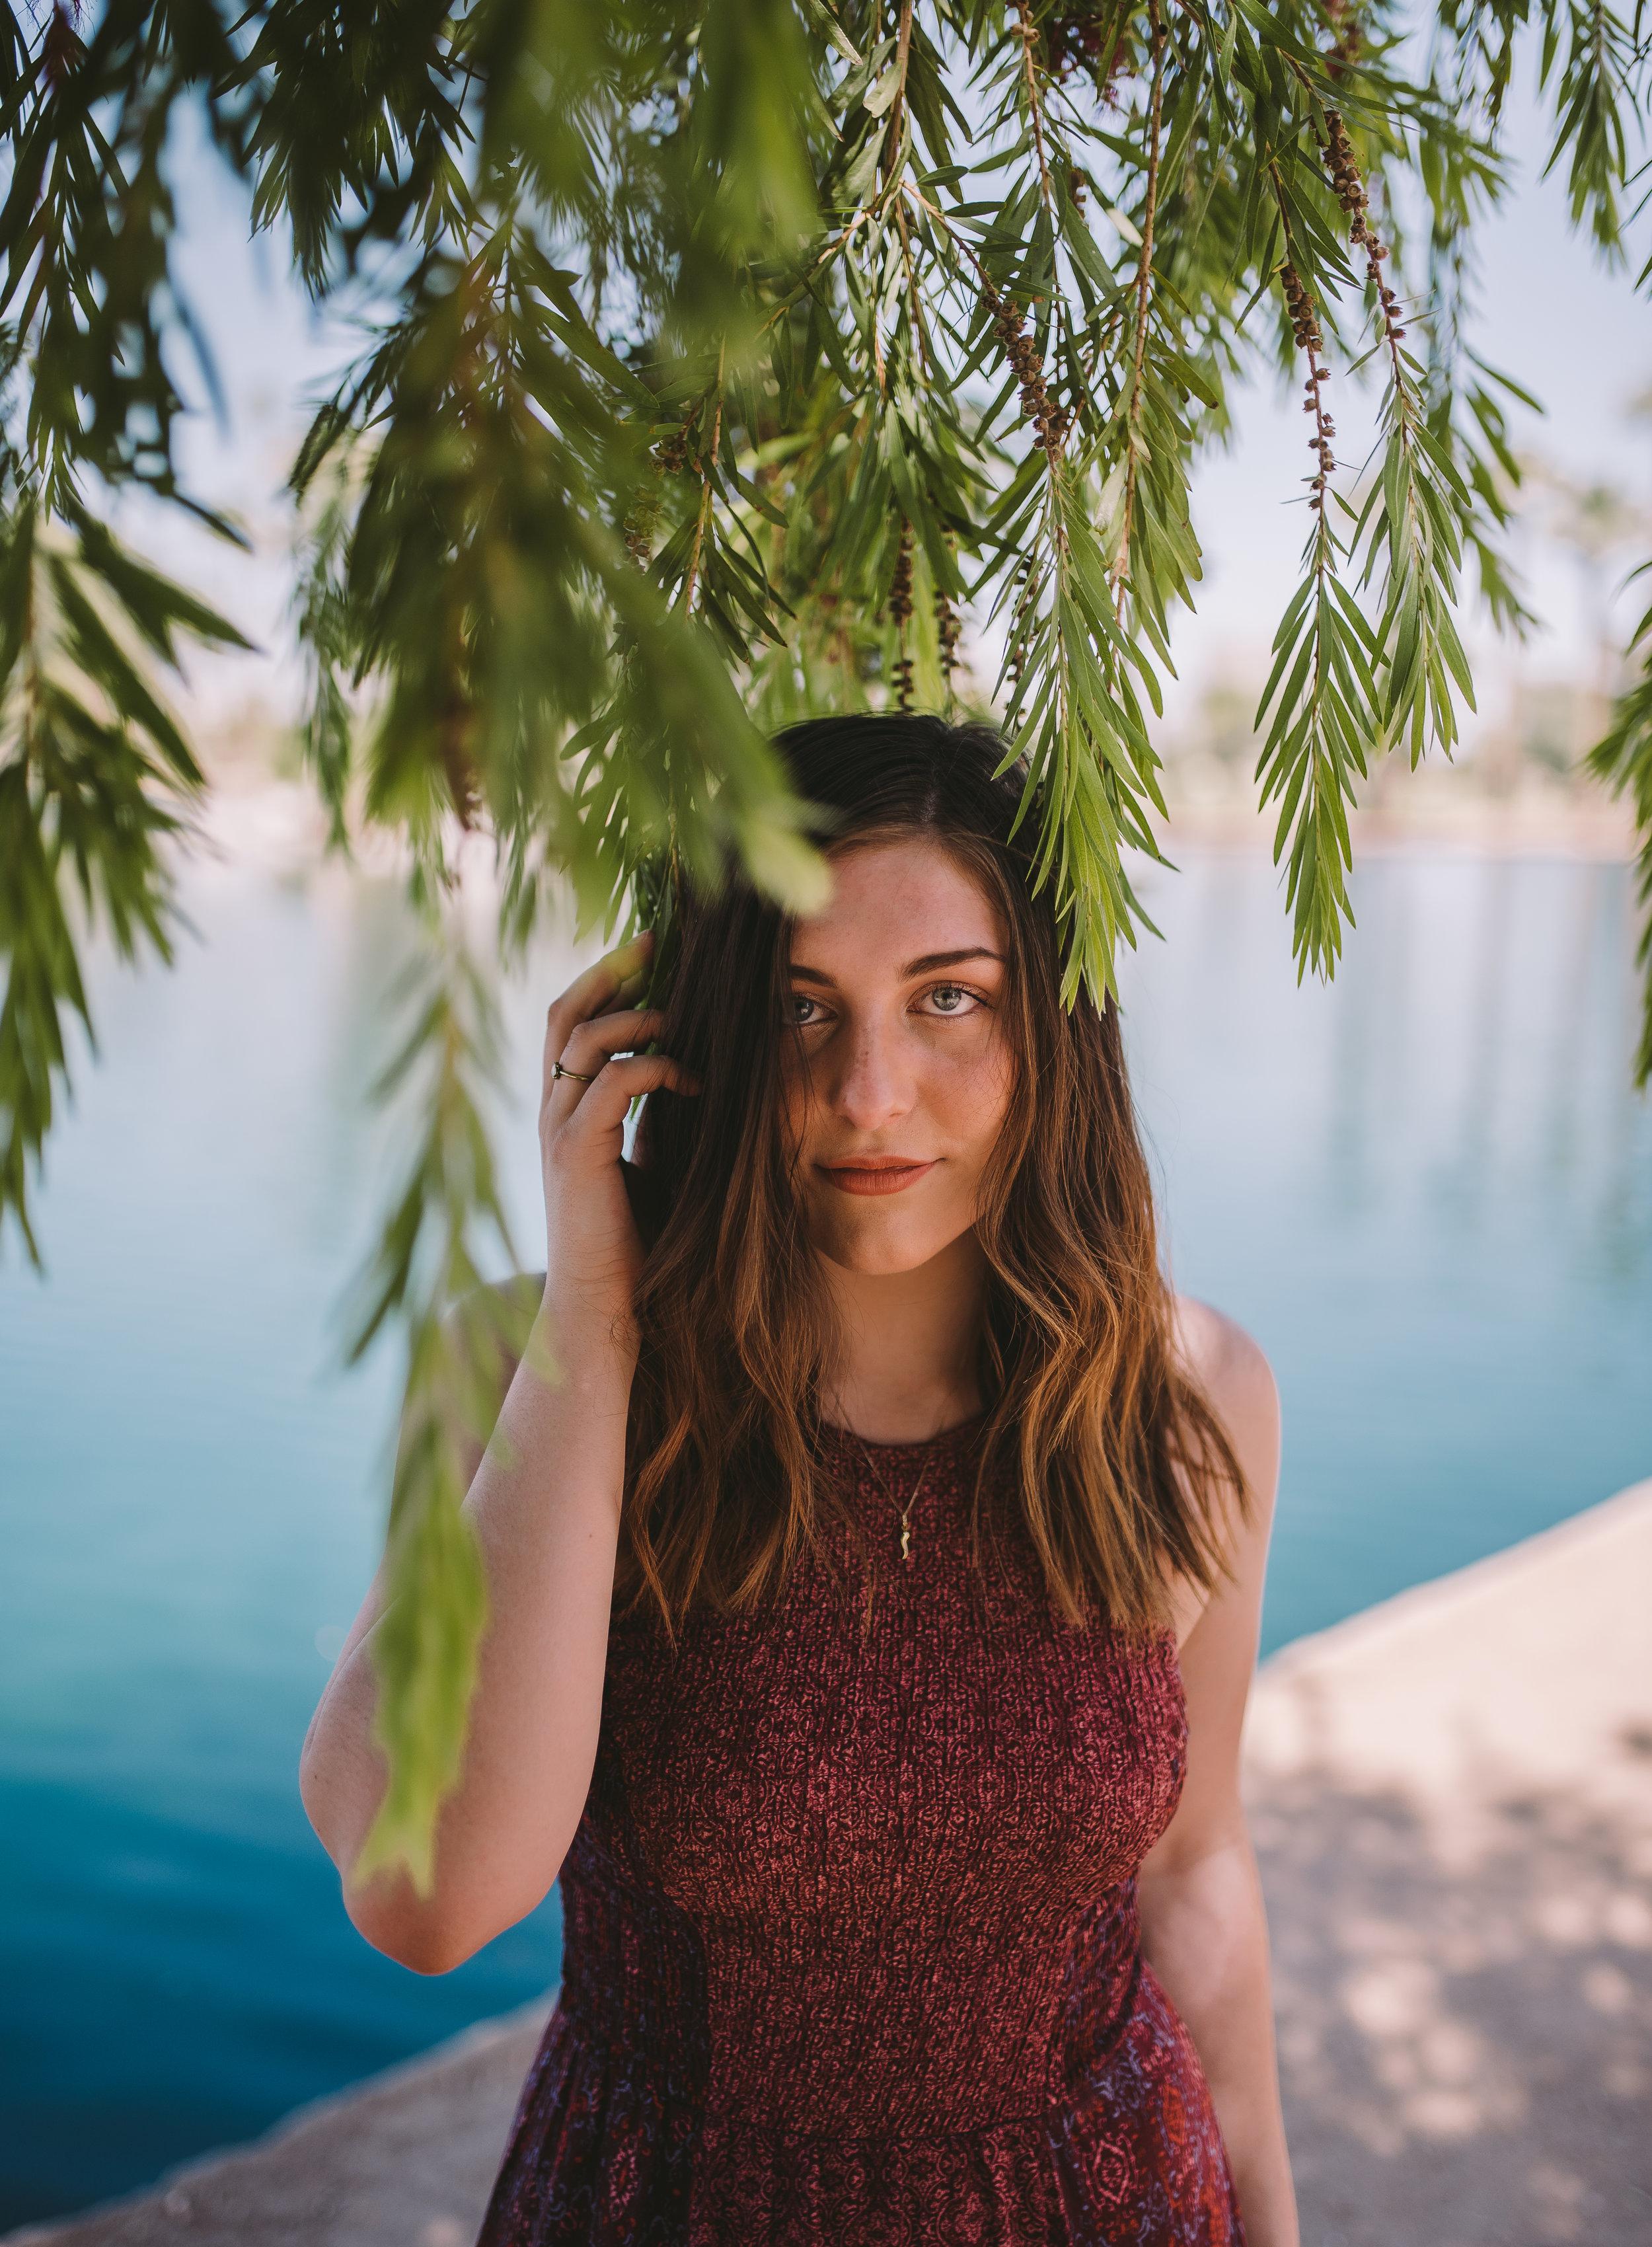 EmilyKidd_PhoenixArizona_June2018_Senior Photography In Phoenix Arizona_ArizonaSeniorPhotographer_SamanthaRosePhotography_BLOG_039.JPG